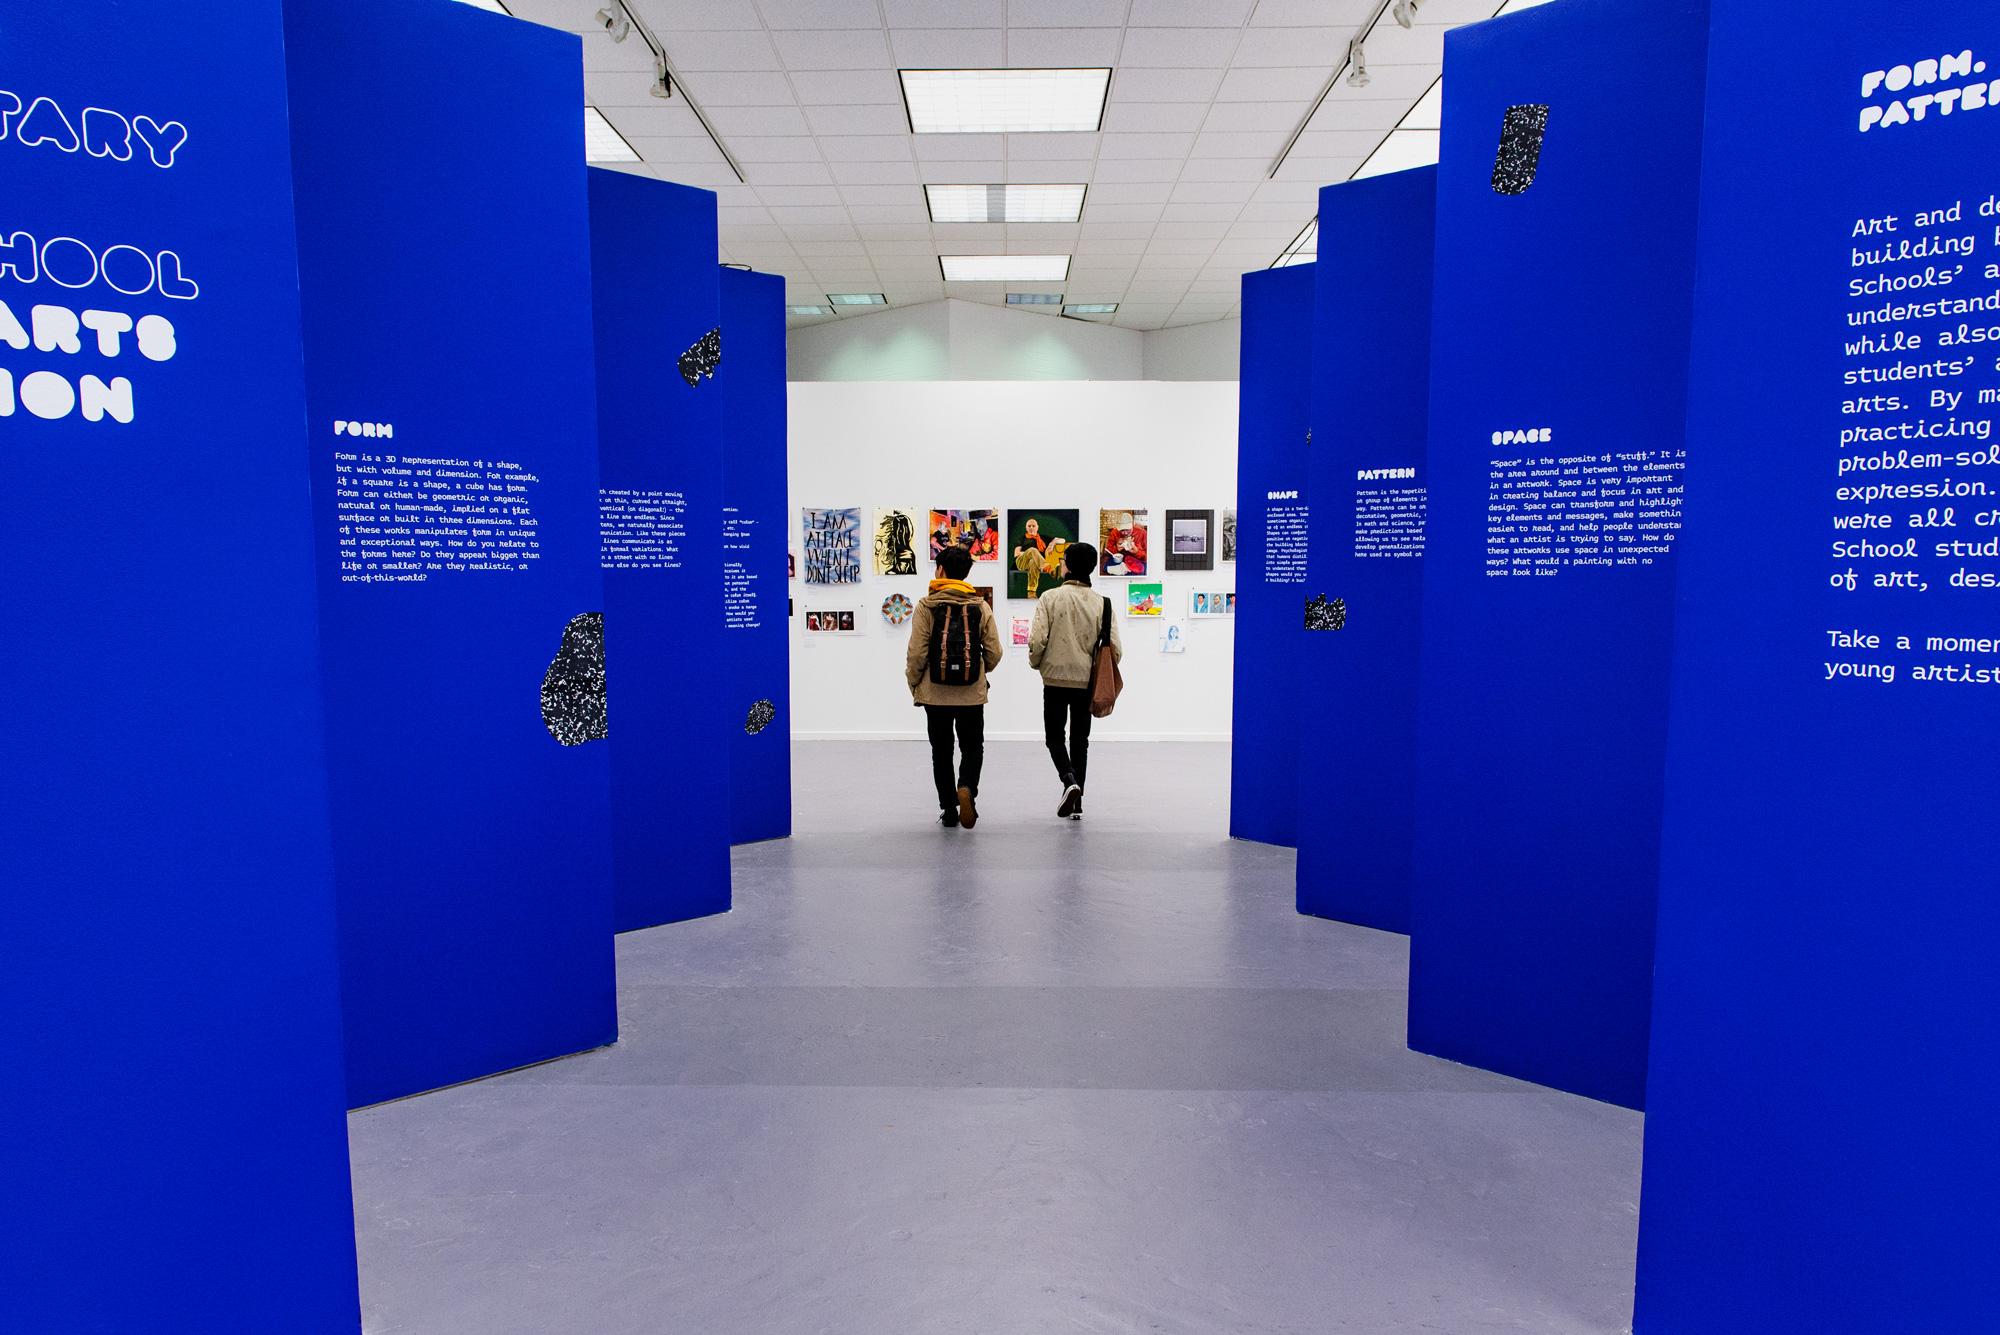 When Art Meets Design: An Overview of the All-City High